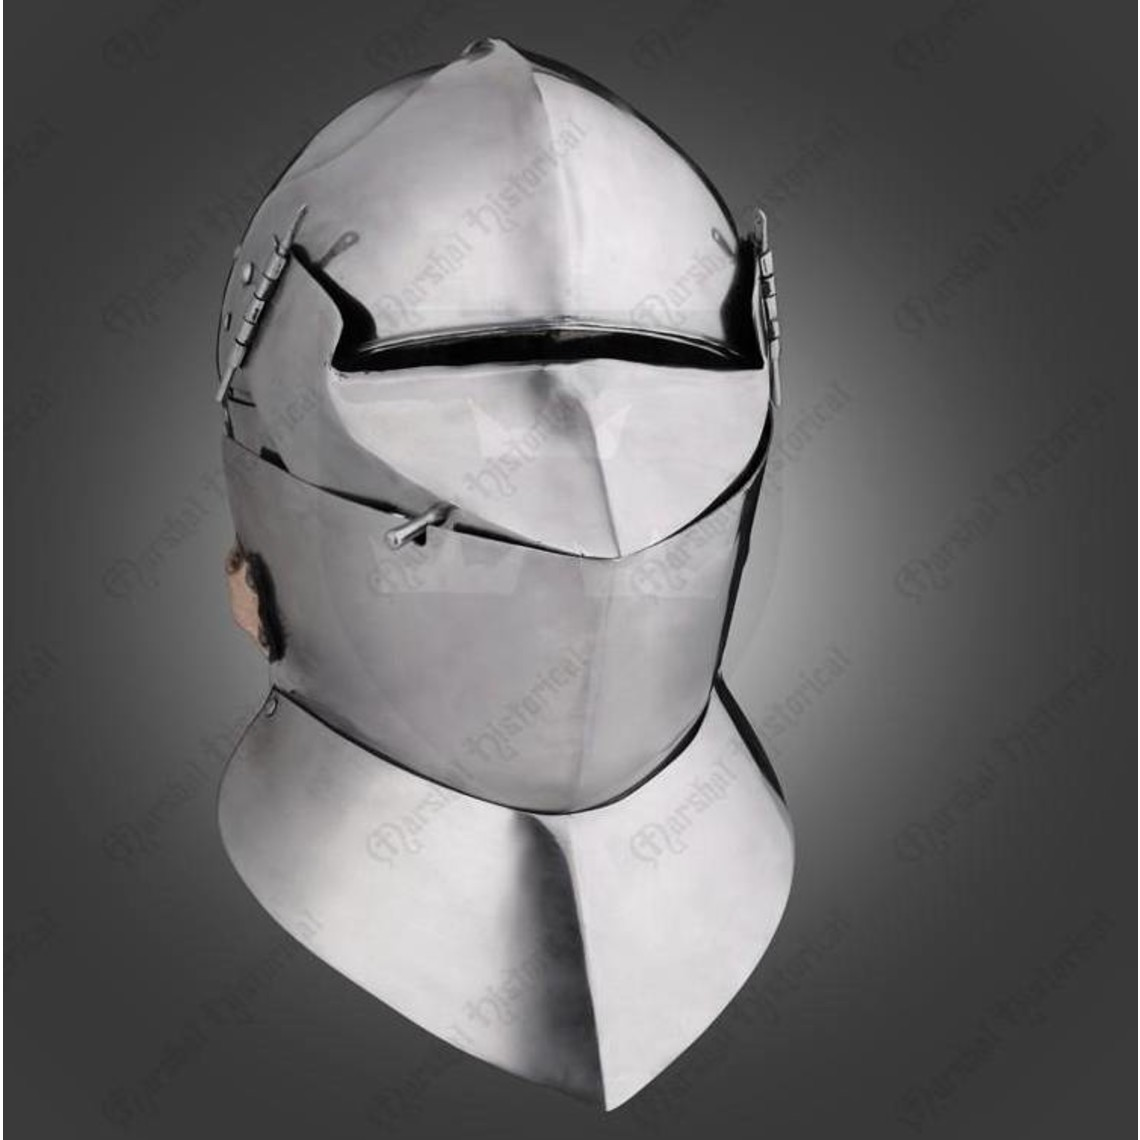 Marshal Historical Casco cerrado Avant Armor